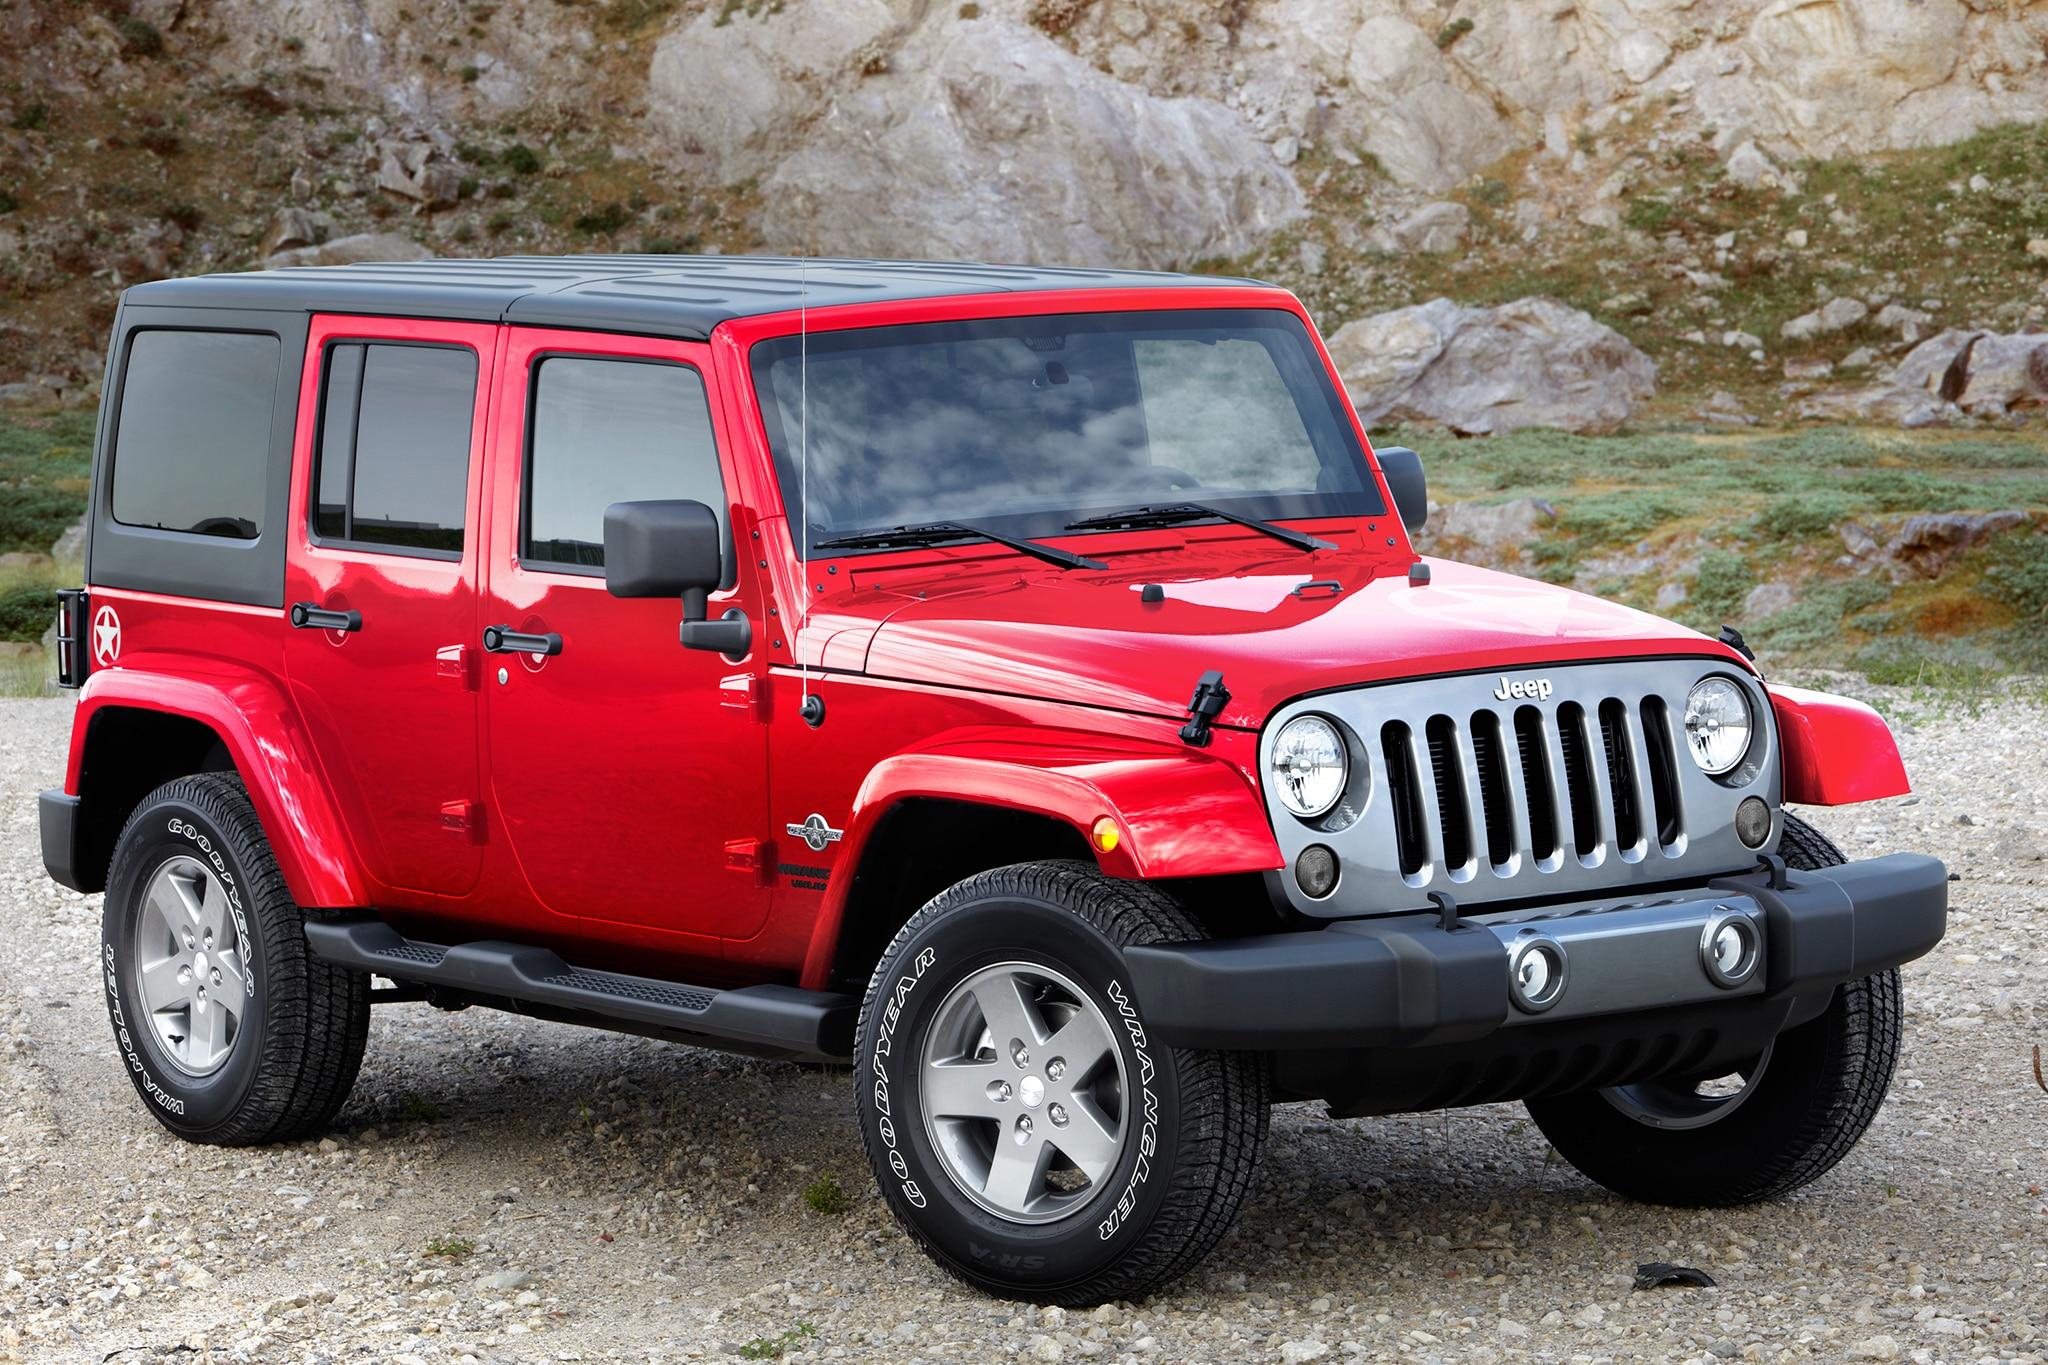 jeep liberty 2014. prevnext jeep liberty 2014 v - paokplay